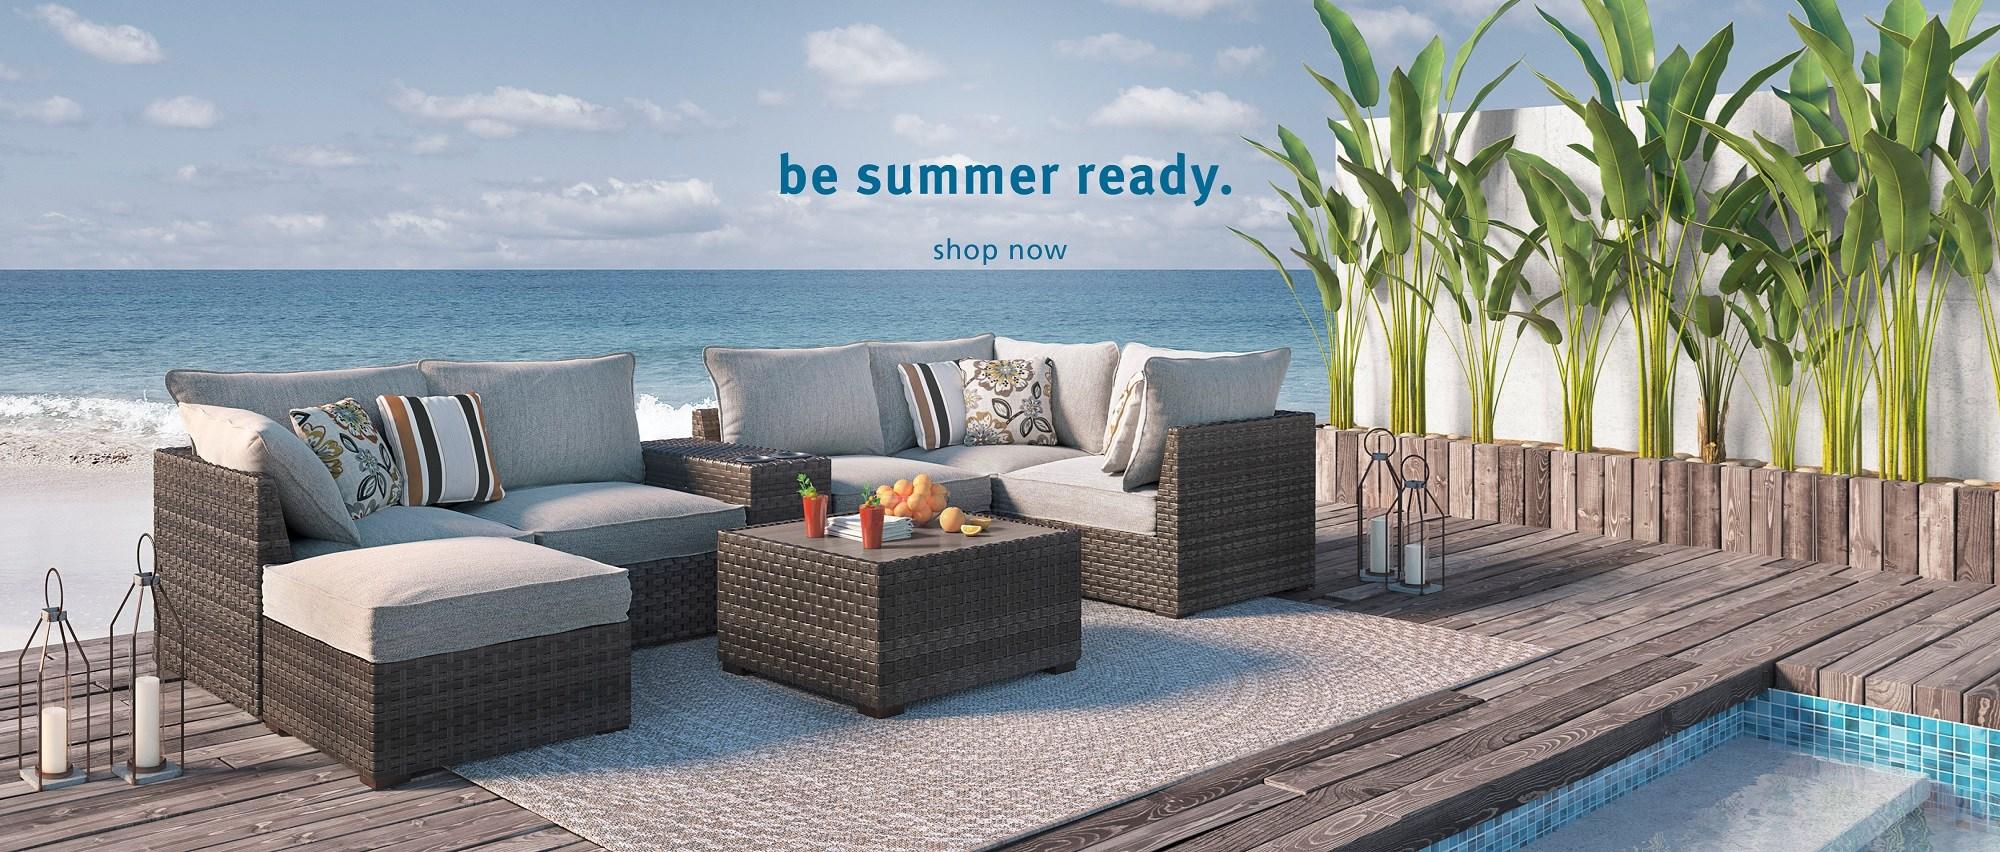 Be Summer Ready. Shop Outdoor.